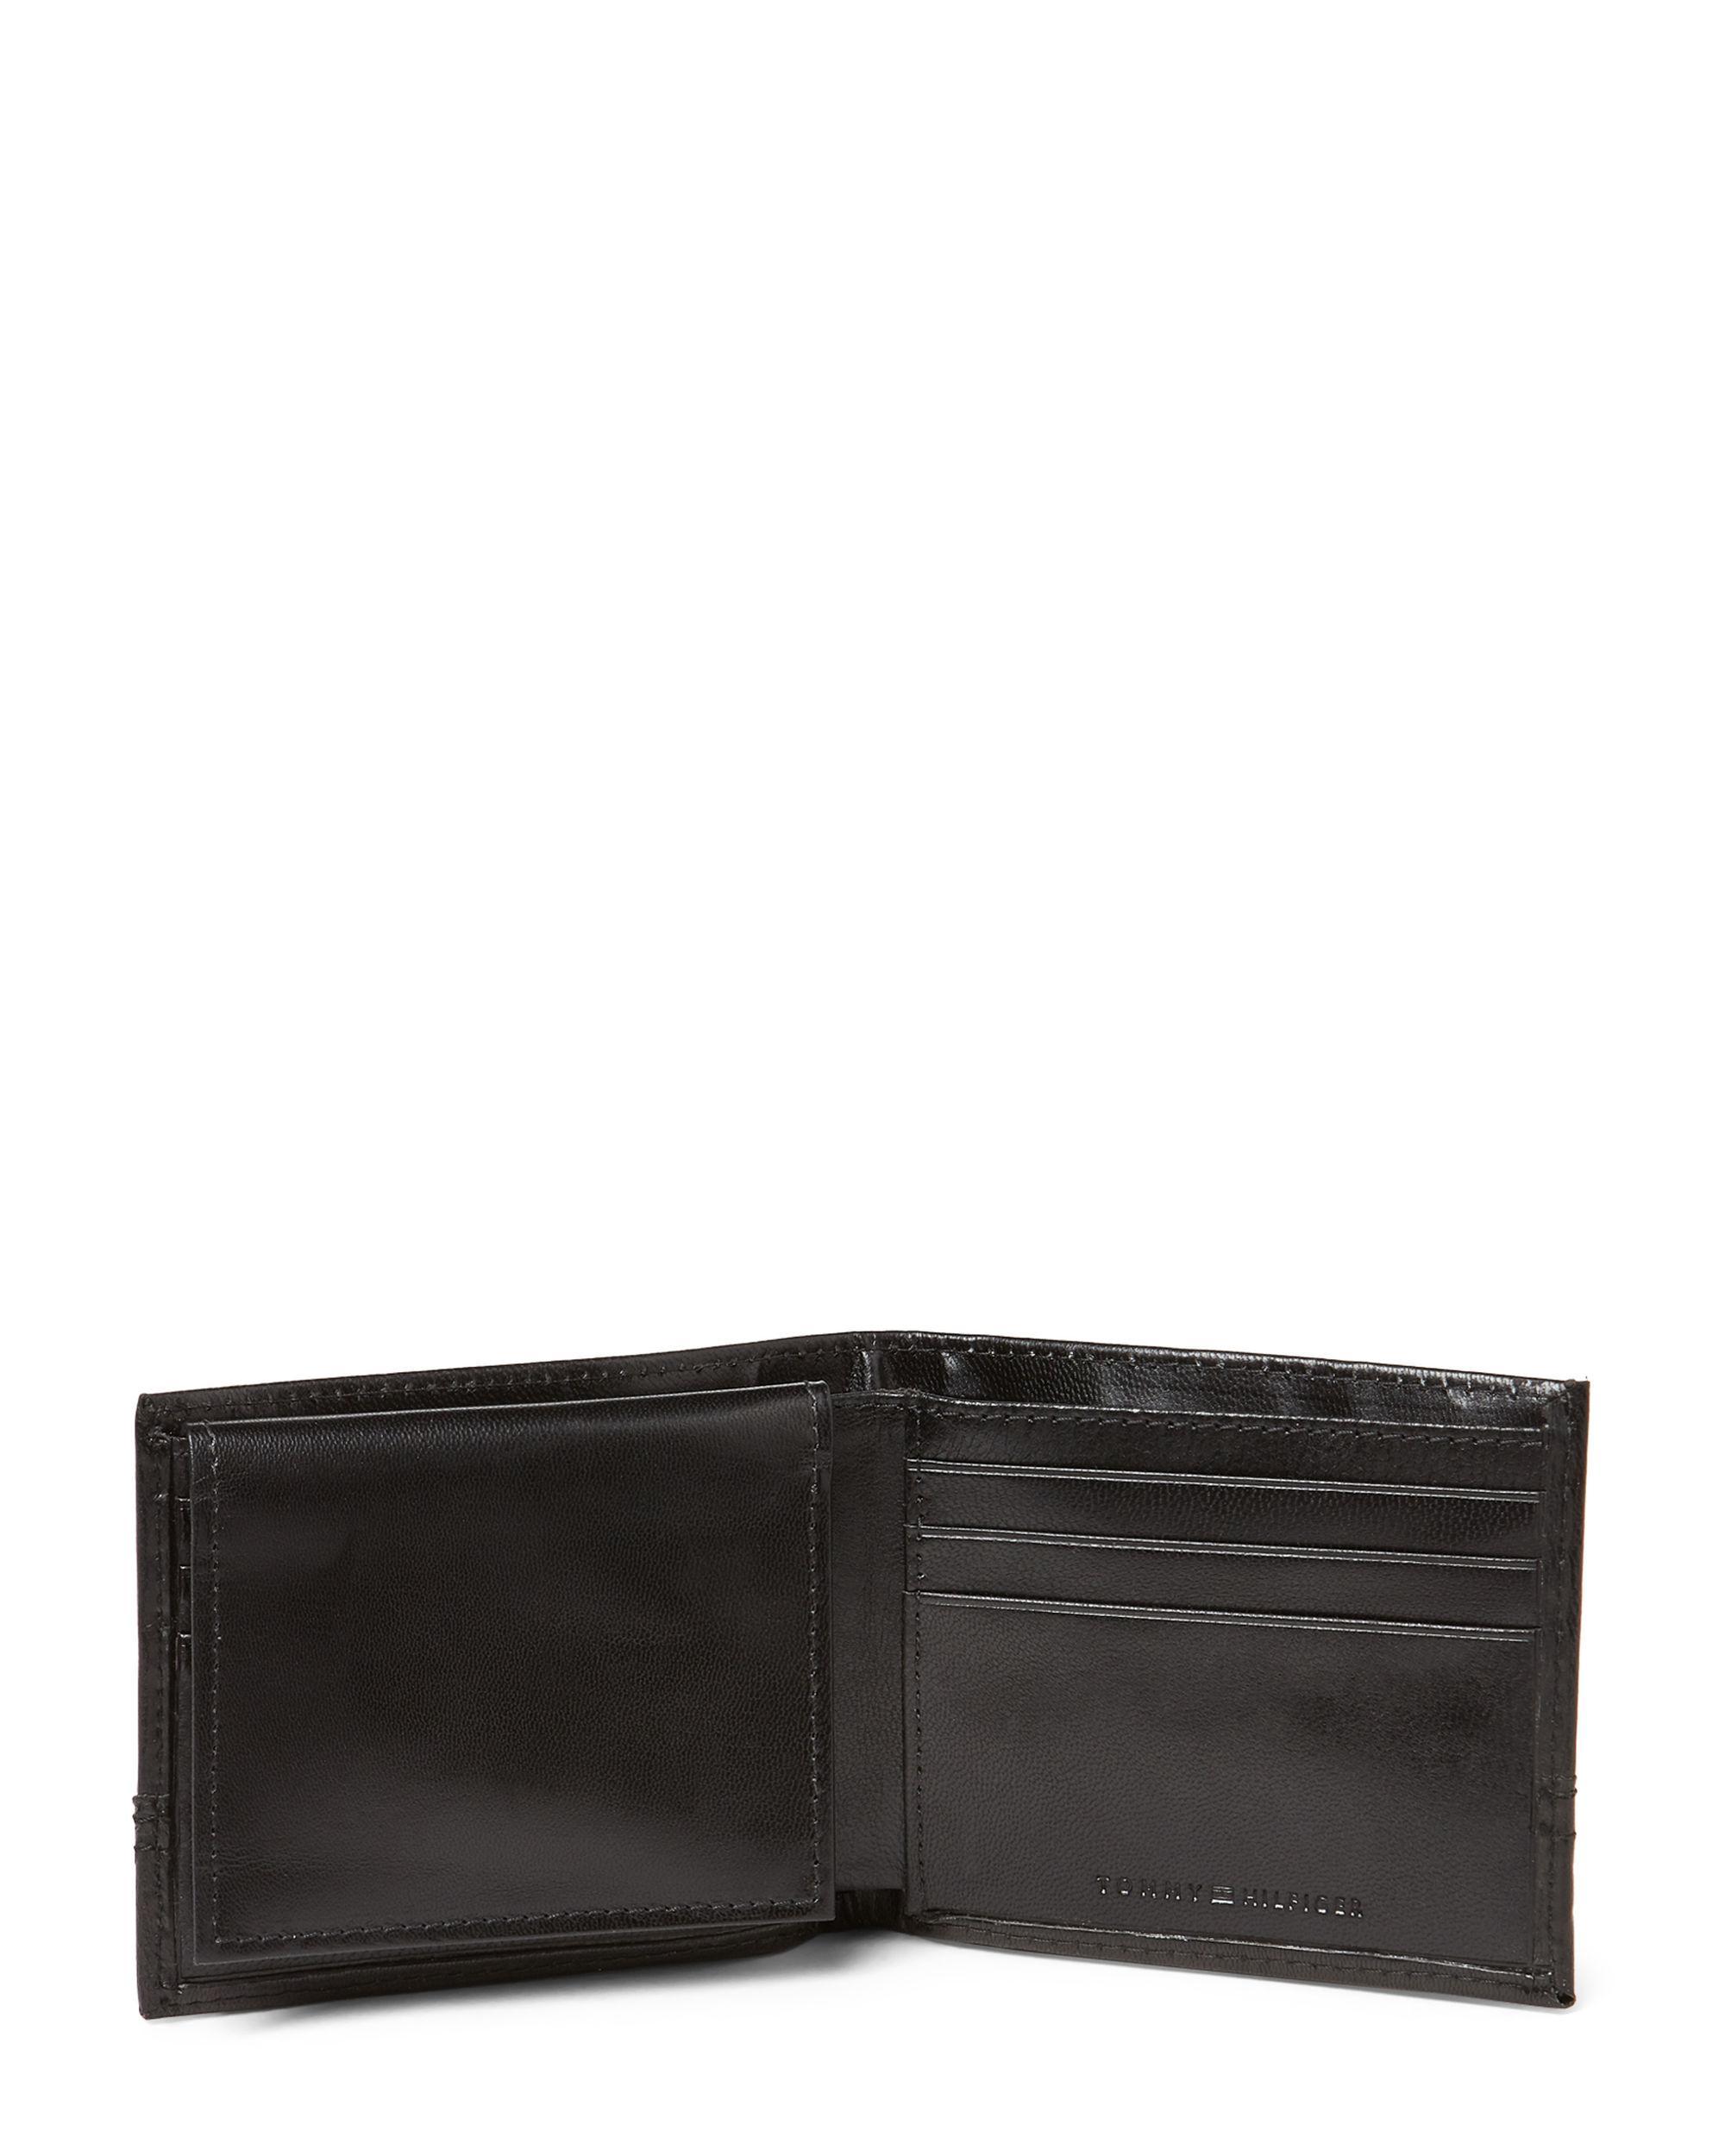 46f800b2 Tommy Hilfiger Brevin Rfid Leather Passcase Wallet in Black for Men ...